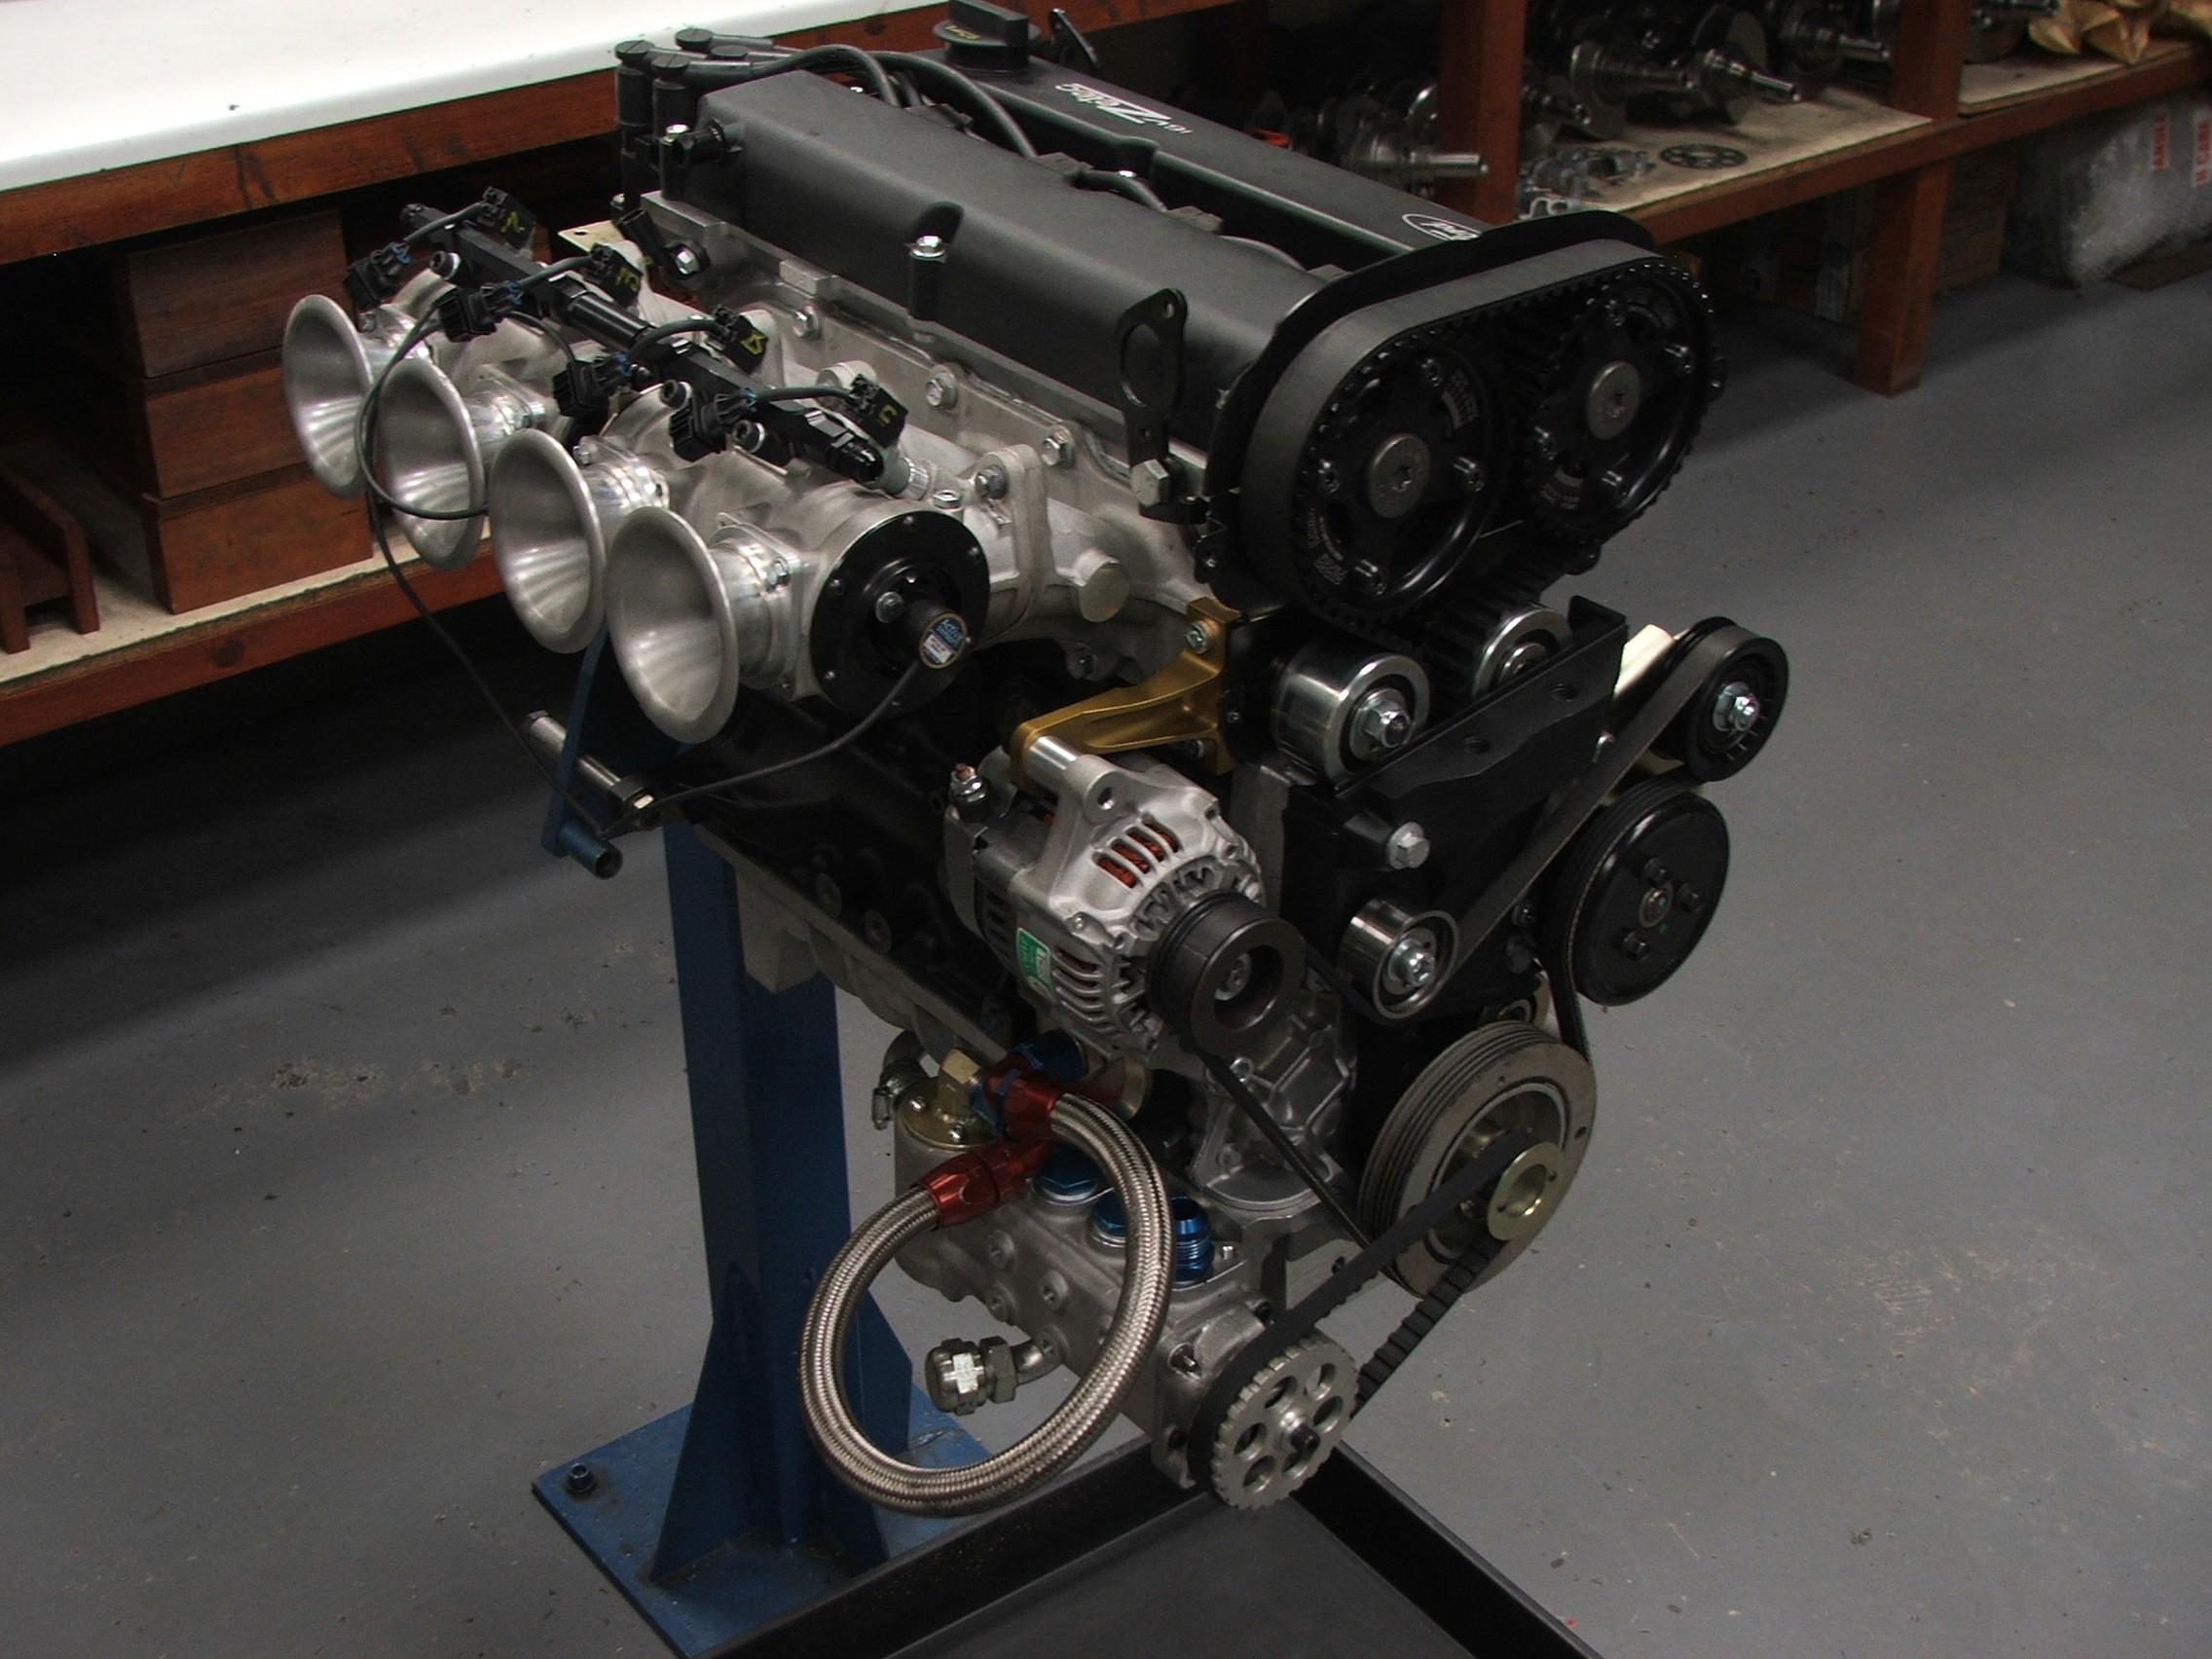 Ford Focus Zetec Engine Diagram Brimoto Ficial Rocket Site Self Build Of Ford Focus Zetec Engine Diagram